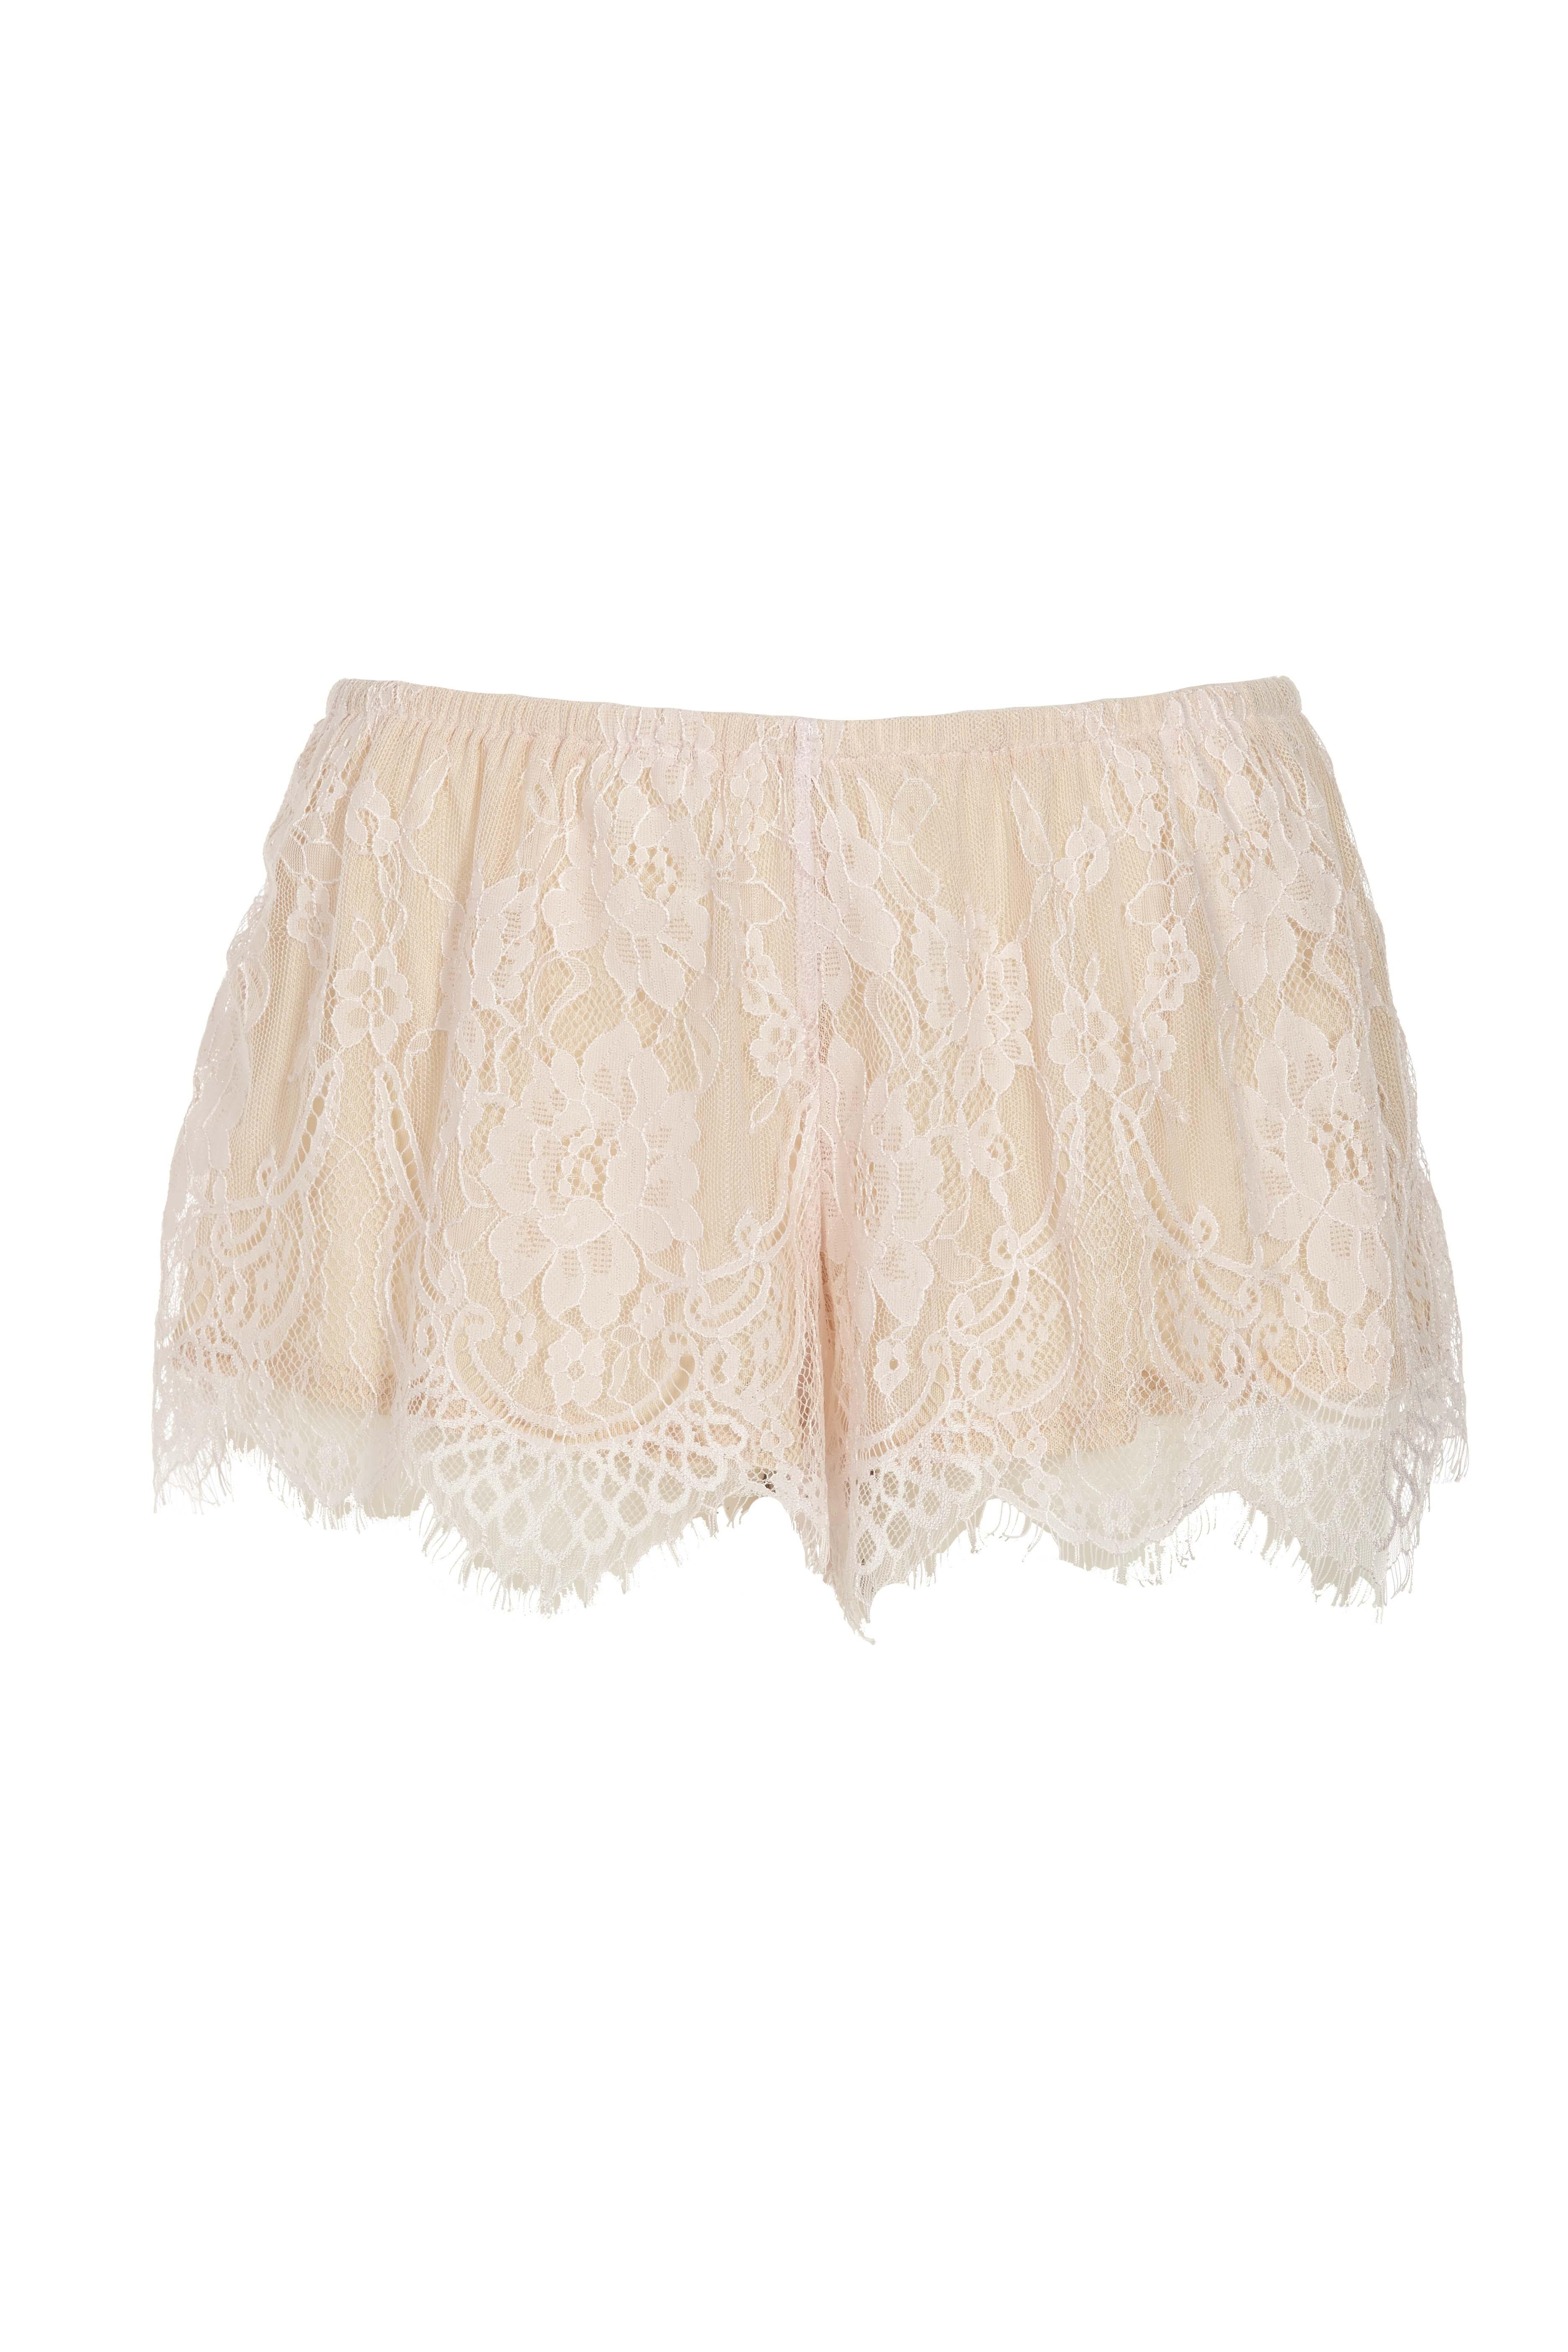 cotton-on-body_bridal-lace-shortie_nz34-95_oct-nov-dec-2